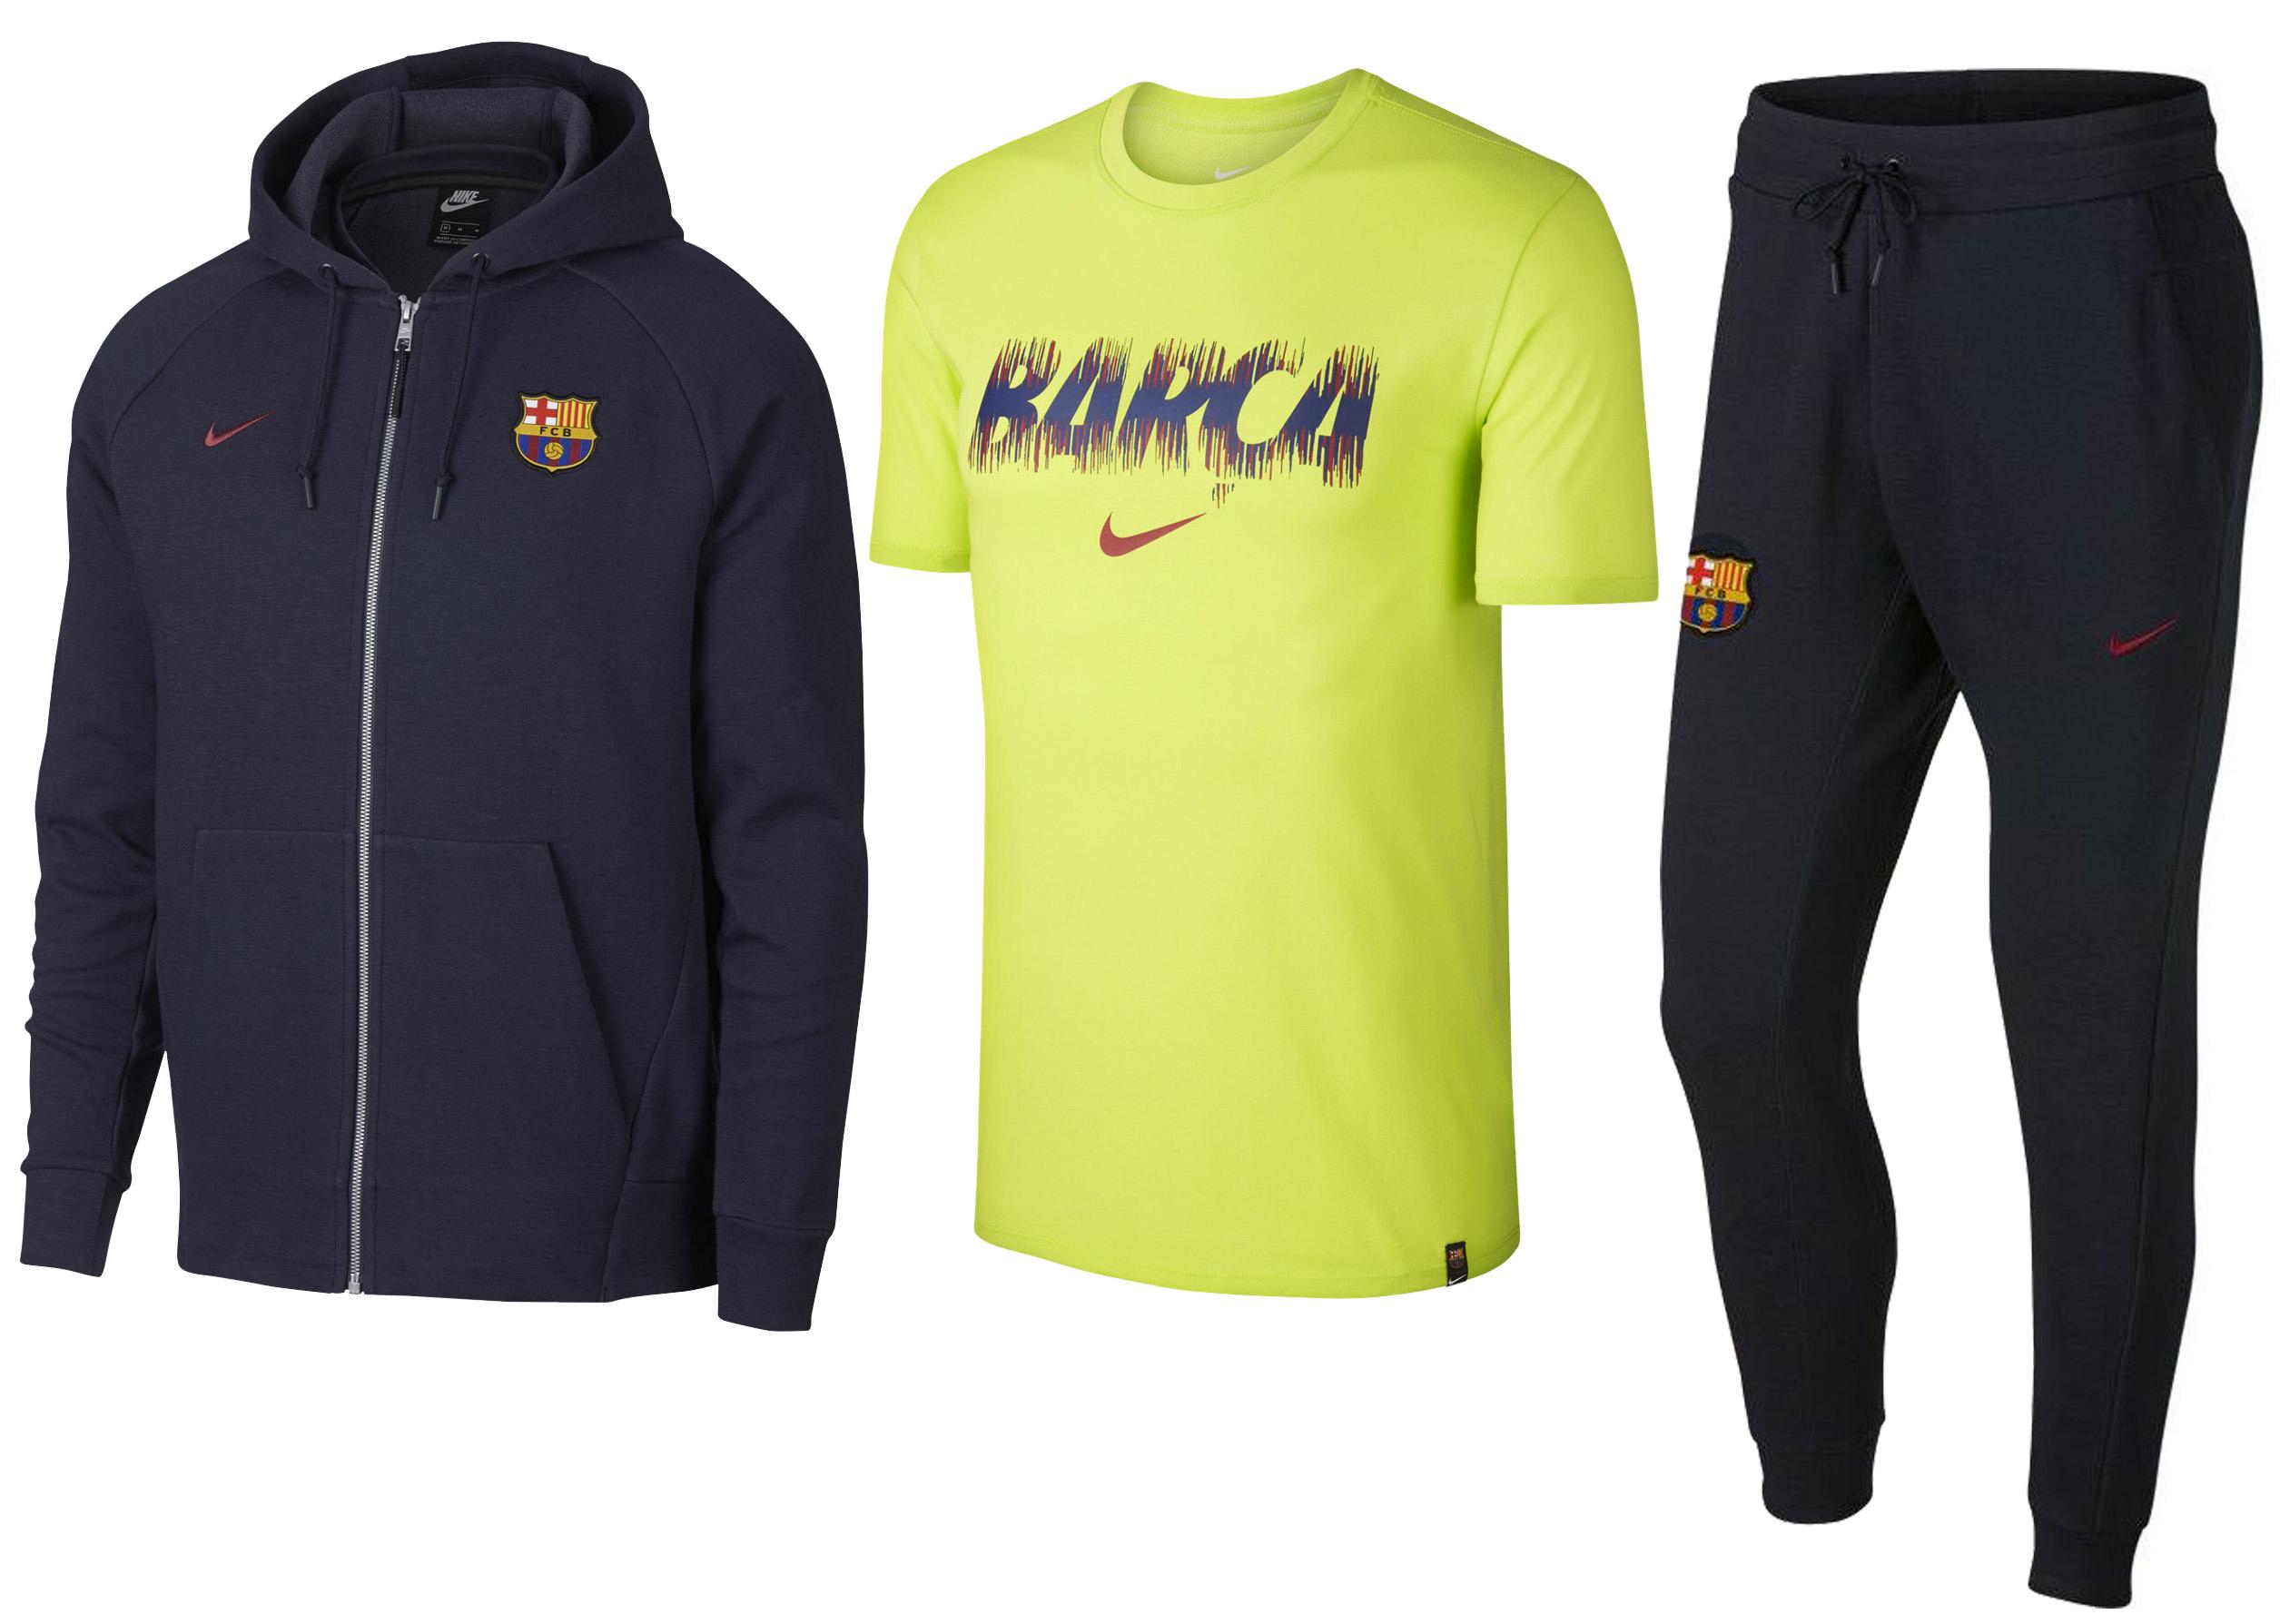 8f574d752e0 Спортивный набор одежды NIKE M FC Barcelona-4 AH7322-455-4